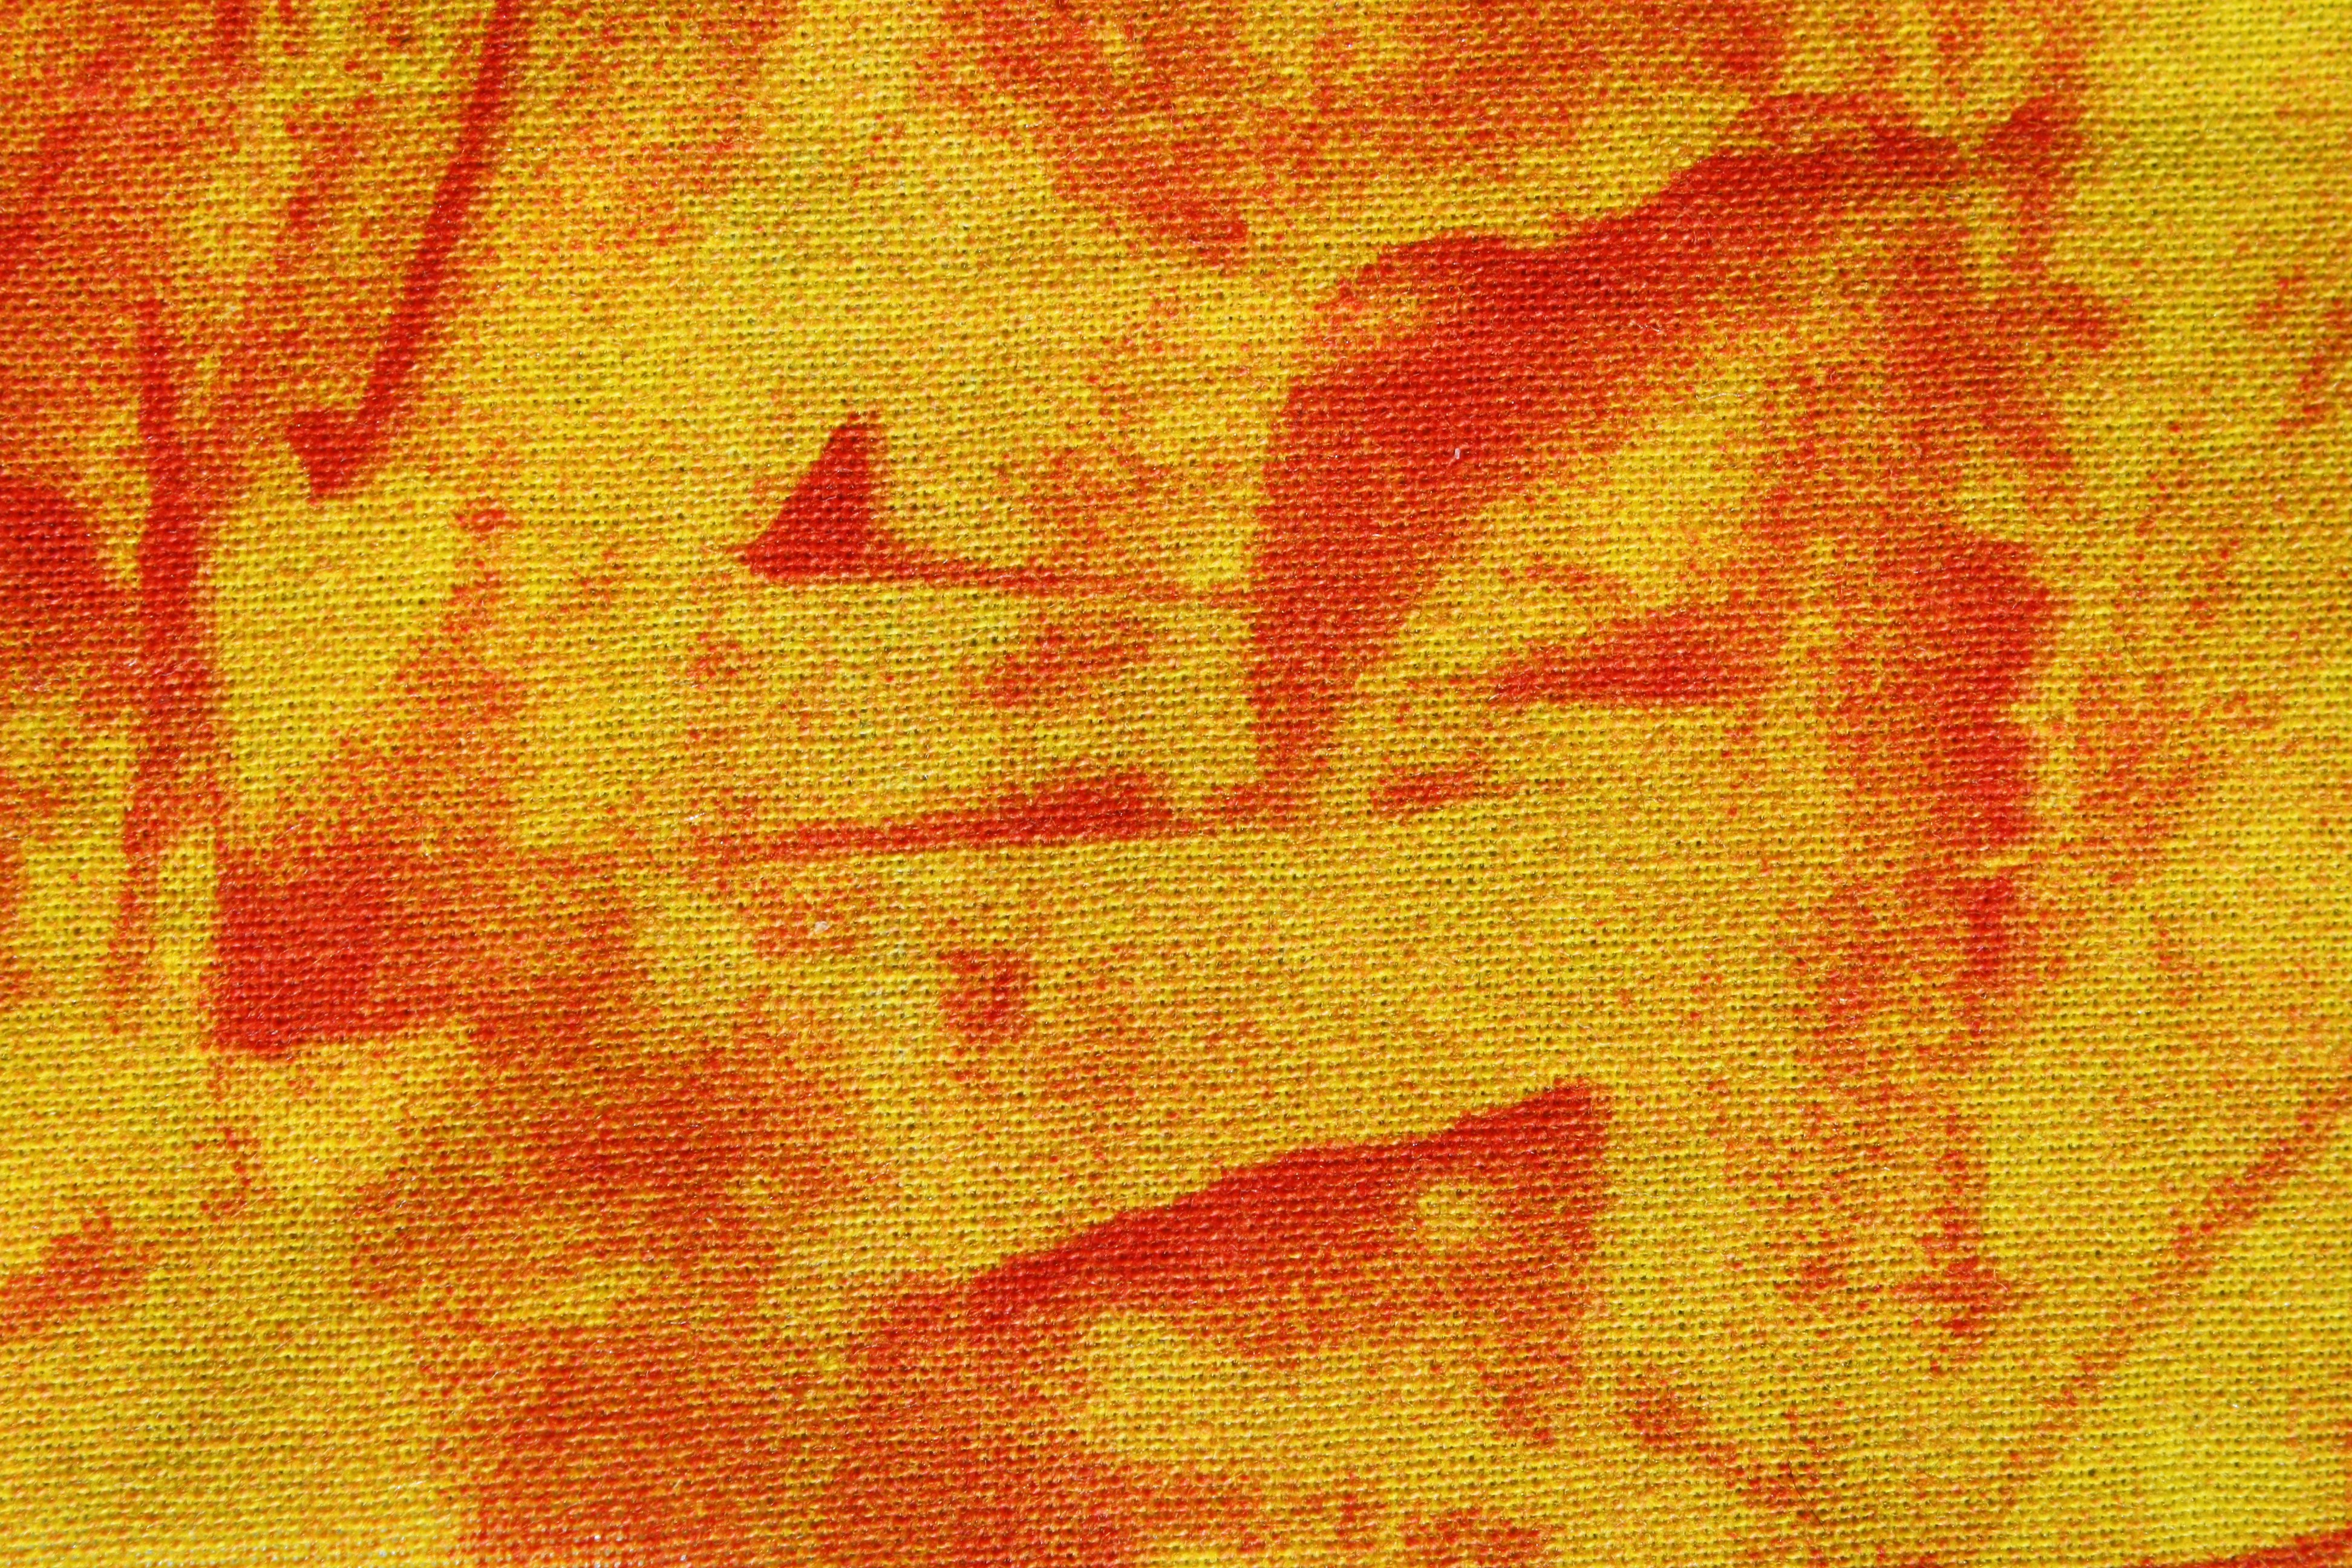 Yellow And Orange Random Pattern Print Fabric Texture